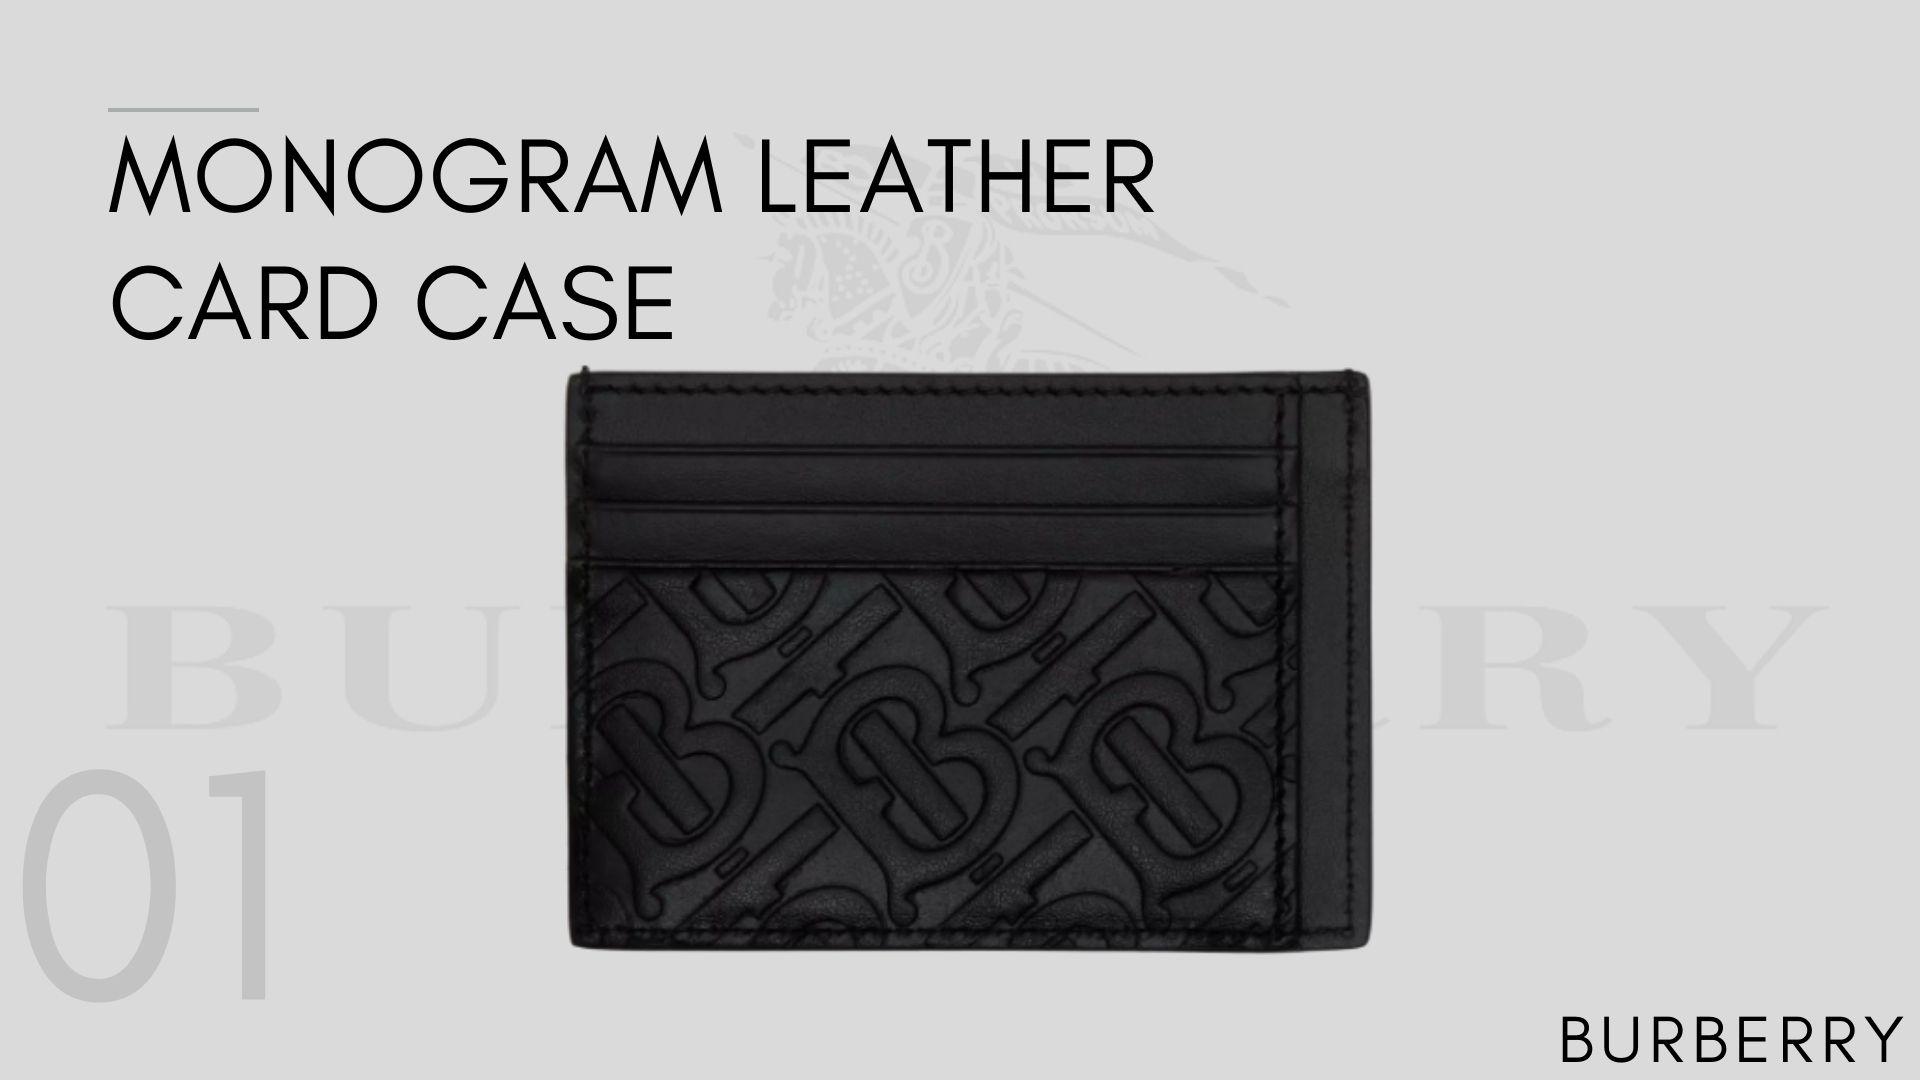 Monogram Leather Card Case 10 กระเป๋าใส่นามบัตรที่ต้องมีไว้ครอบครอง